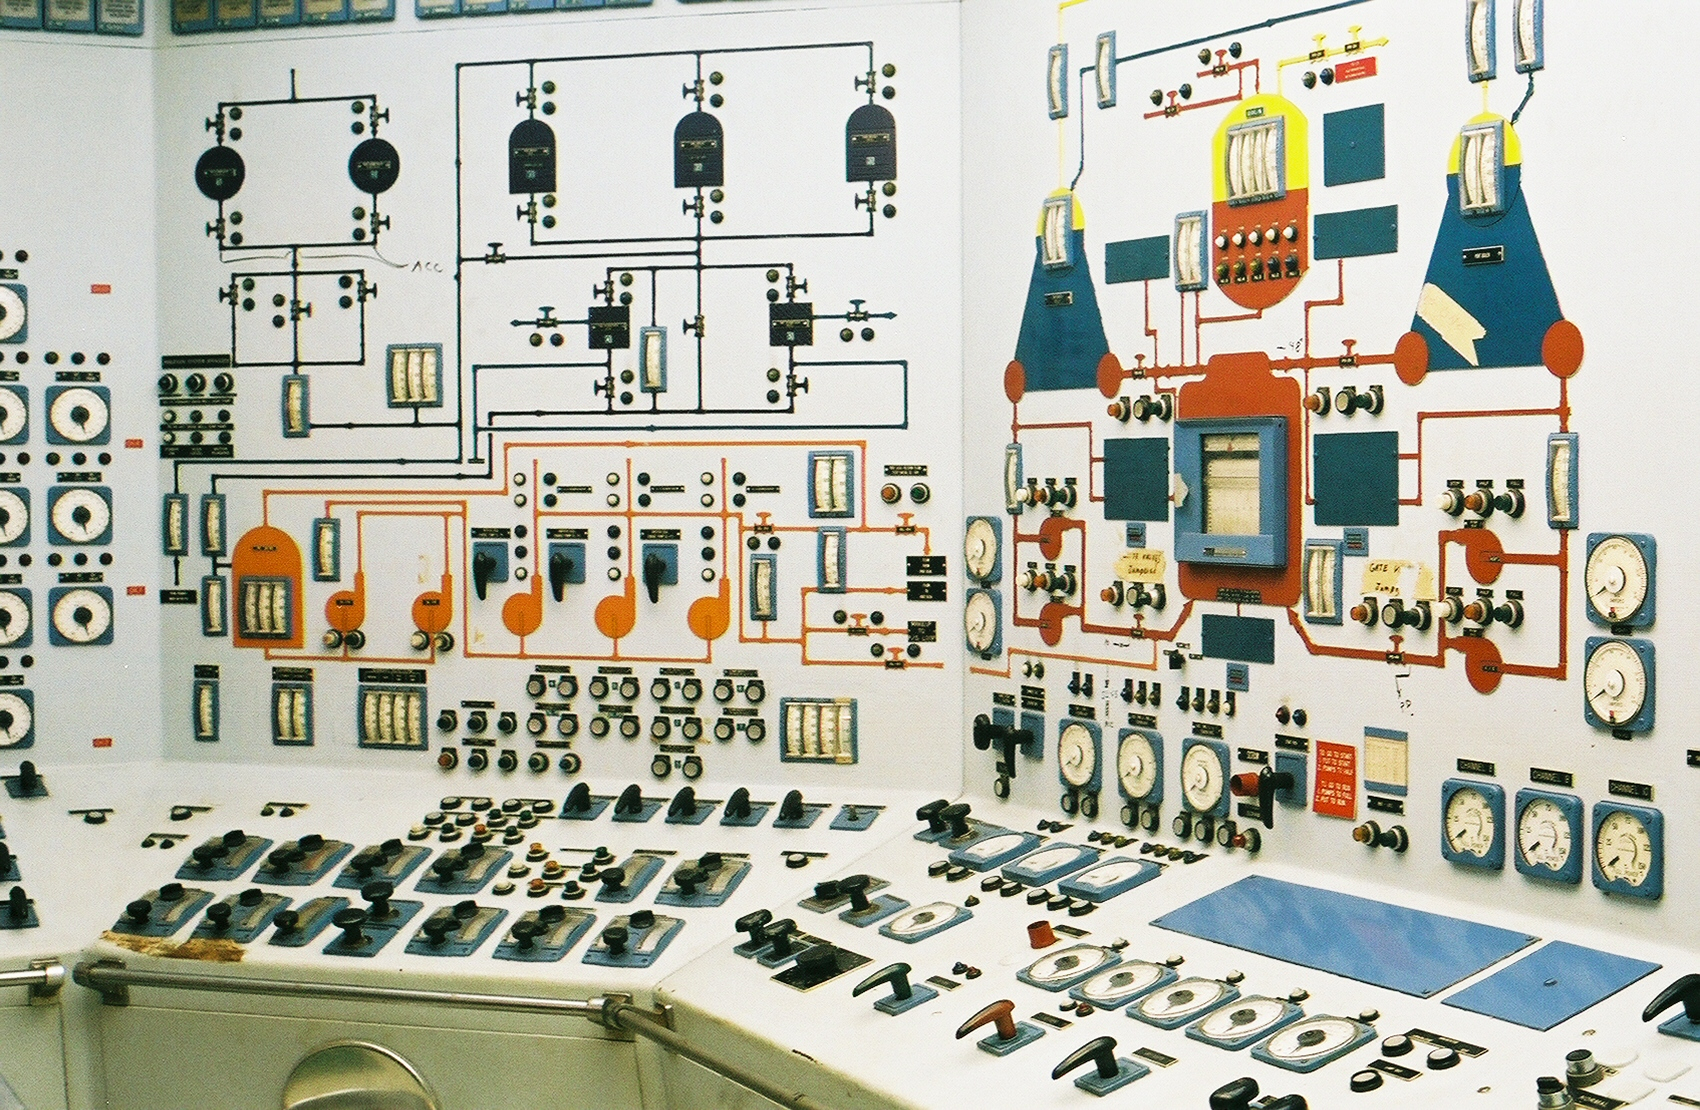 nuclear_ship_savannah_-_reactor_control_room_-_center_and_left_panels